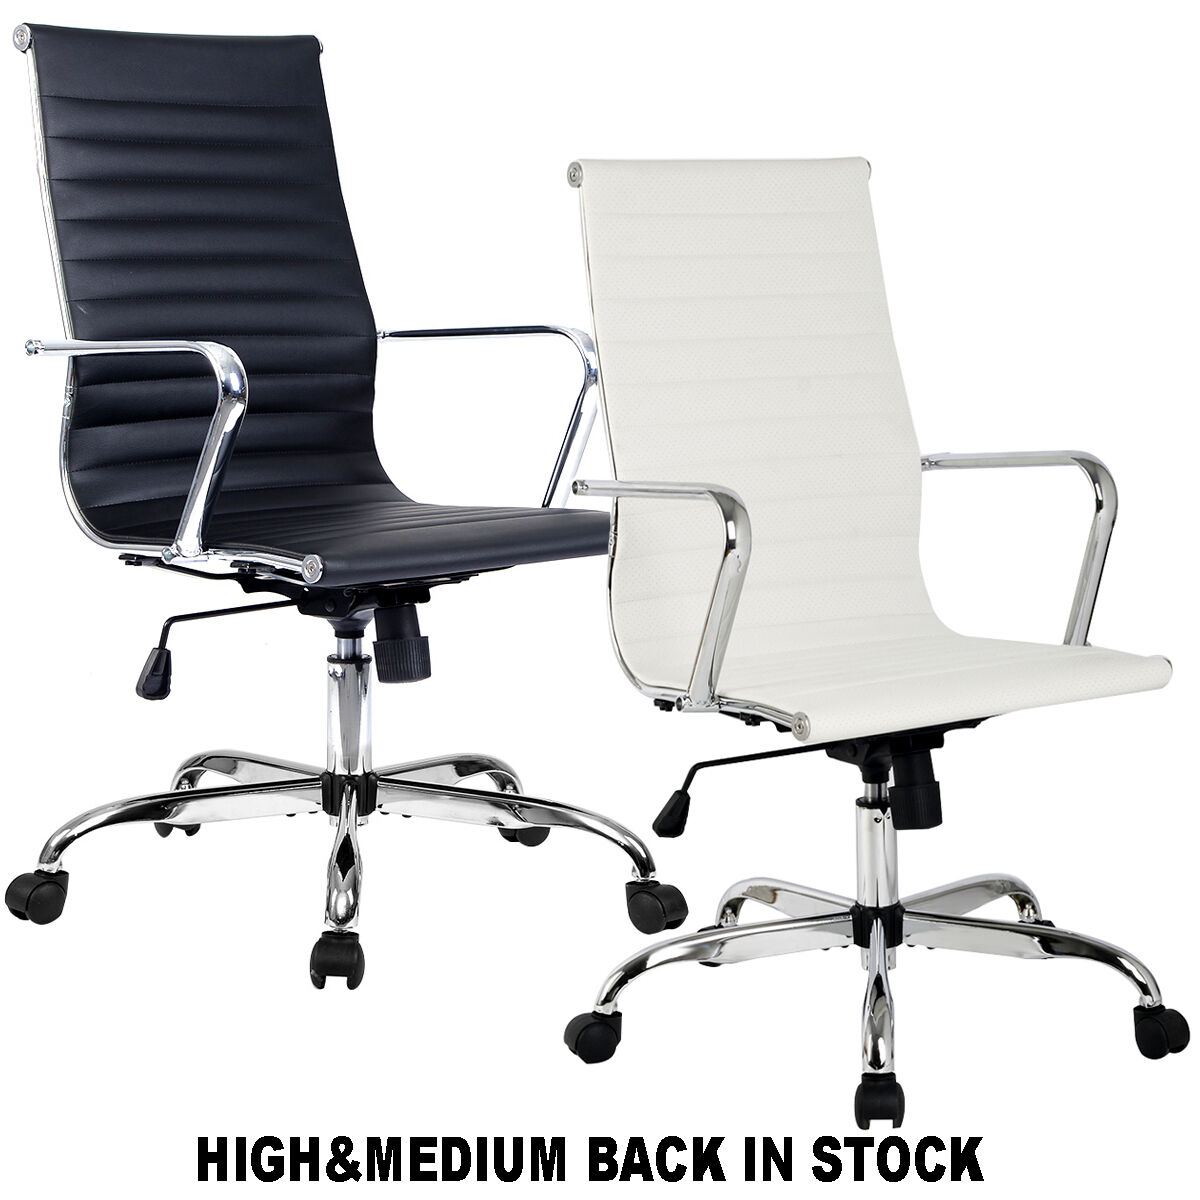 ergonomic office chair ebay ikea drafting modern pu leather high andmed back